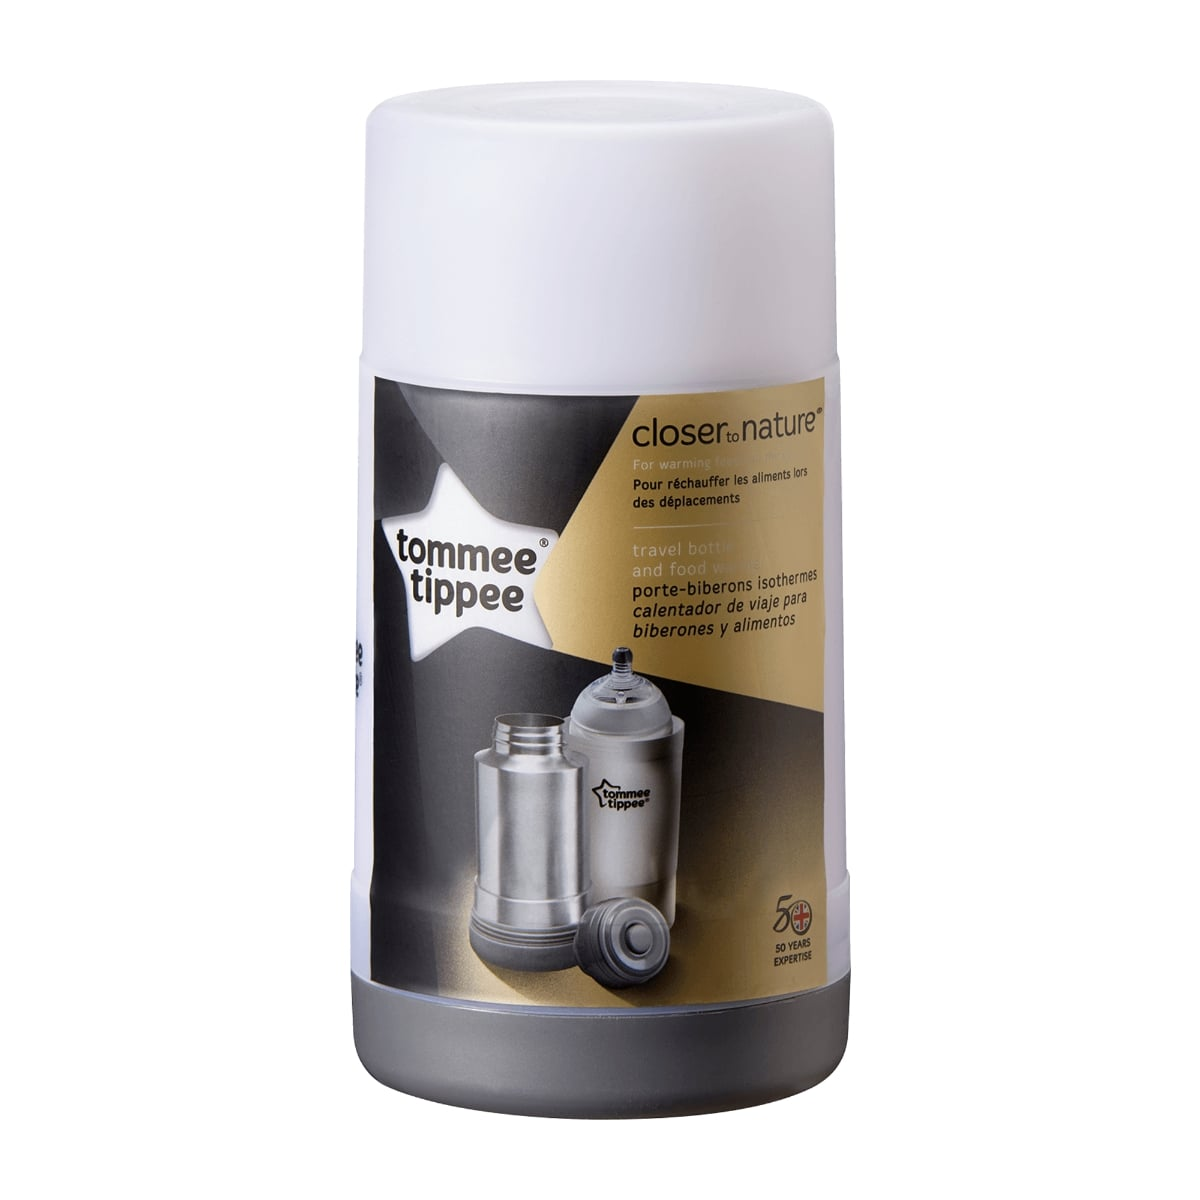 Tommee Tippee Travel Bottle & Food Warmer - Argos.